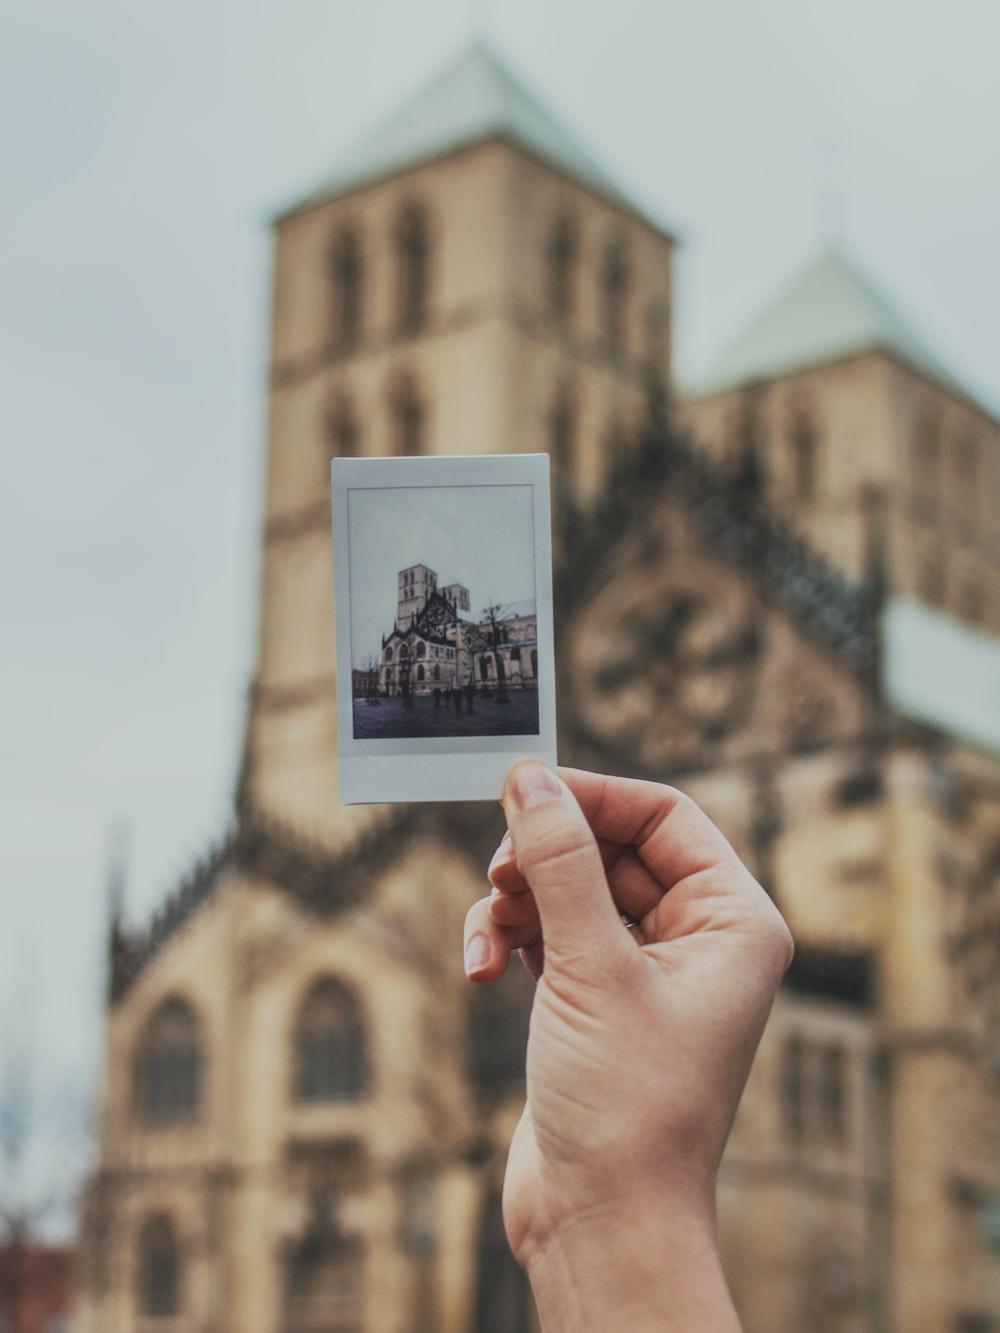 person holding brown concrete building photo